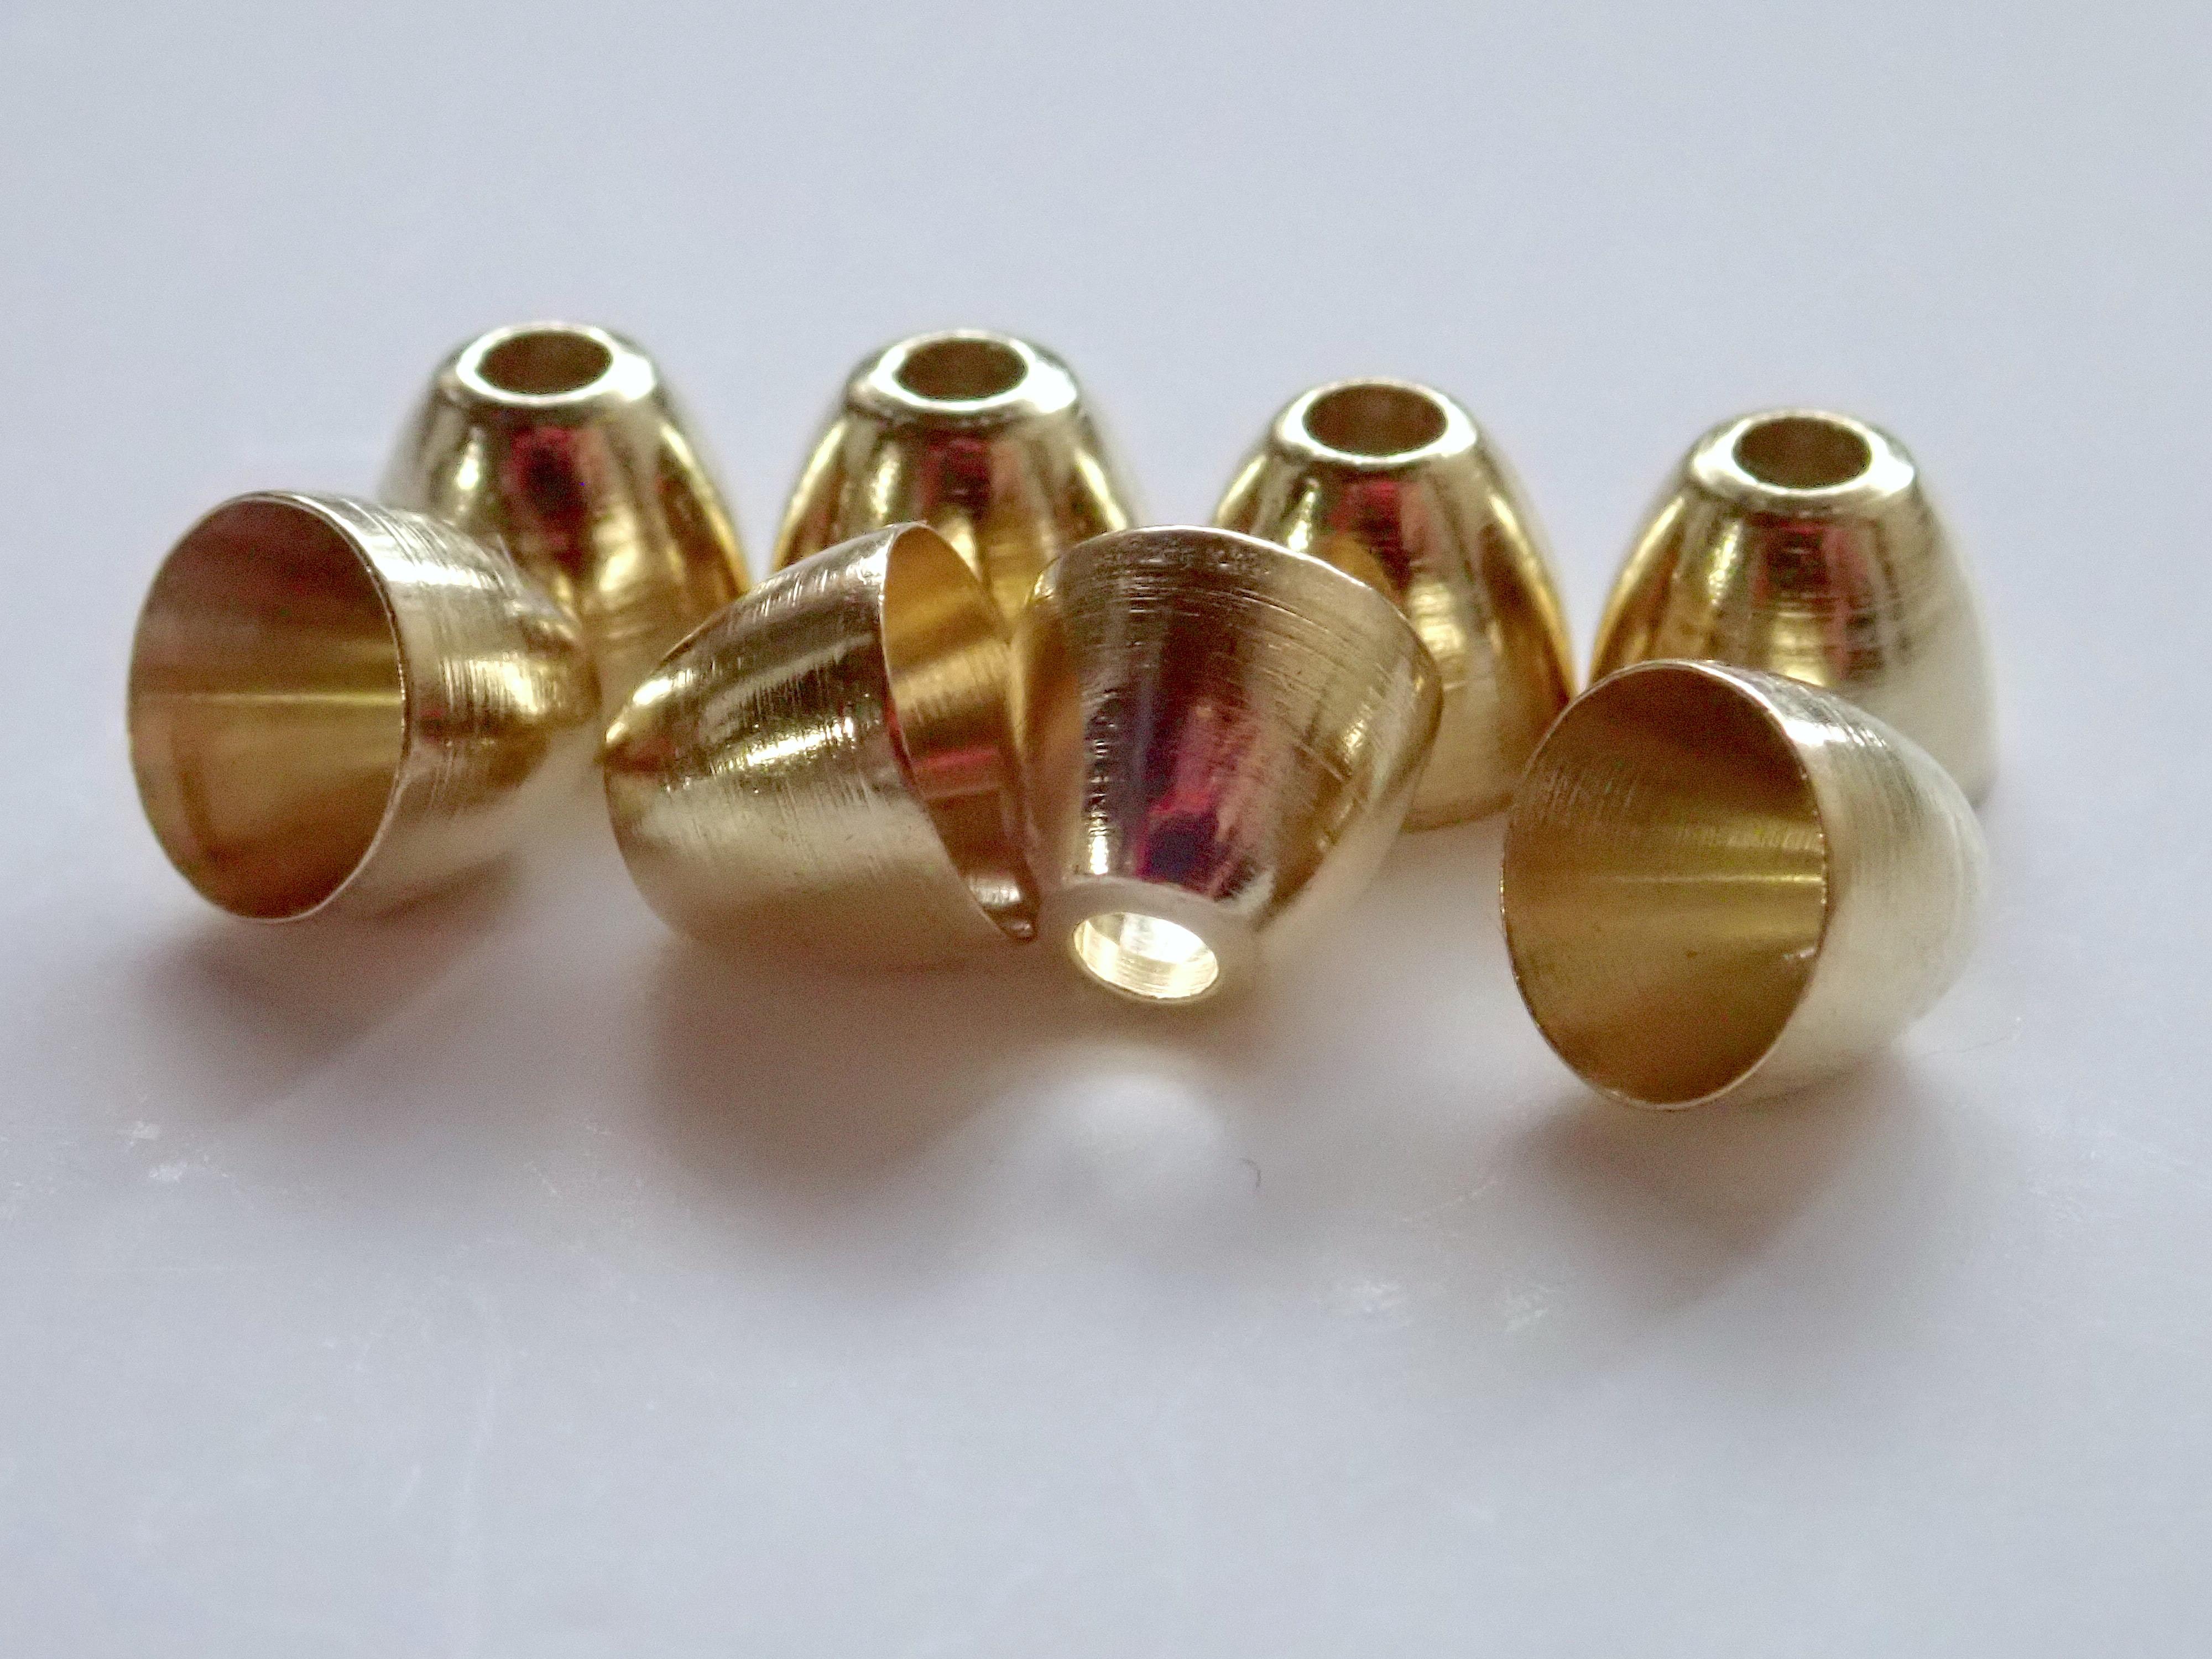 【 AFS Original 】Brass Cone Head 50pcs. / AFS ブラス コーンヘッド